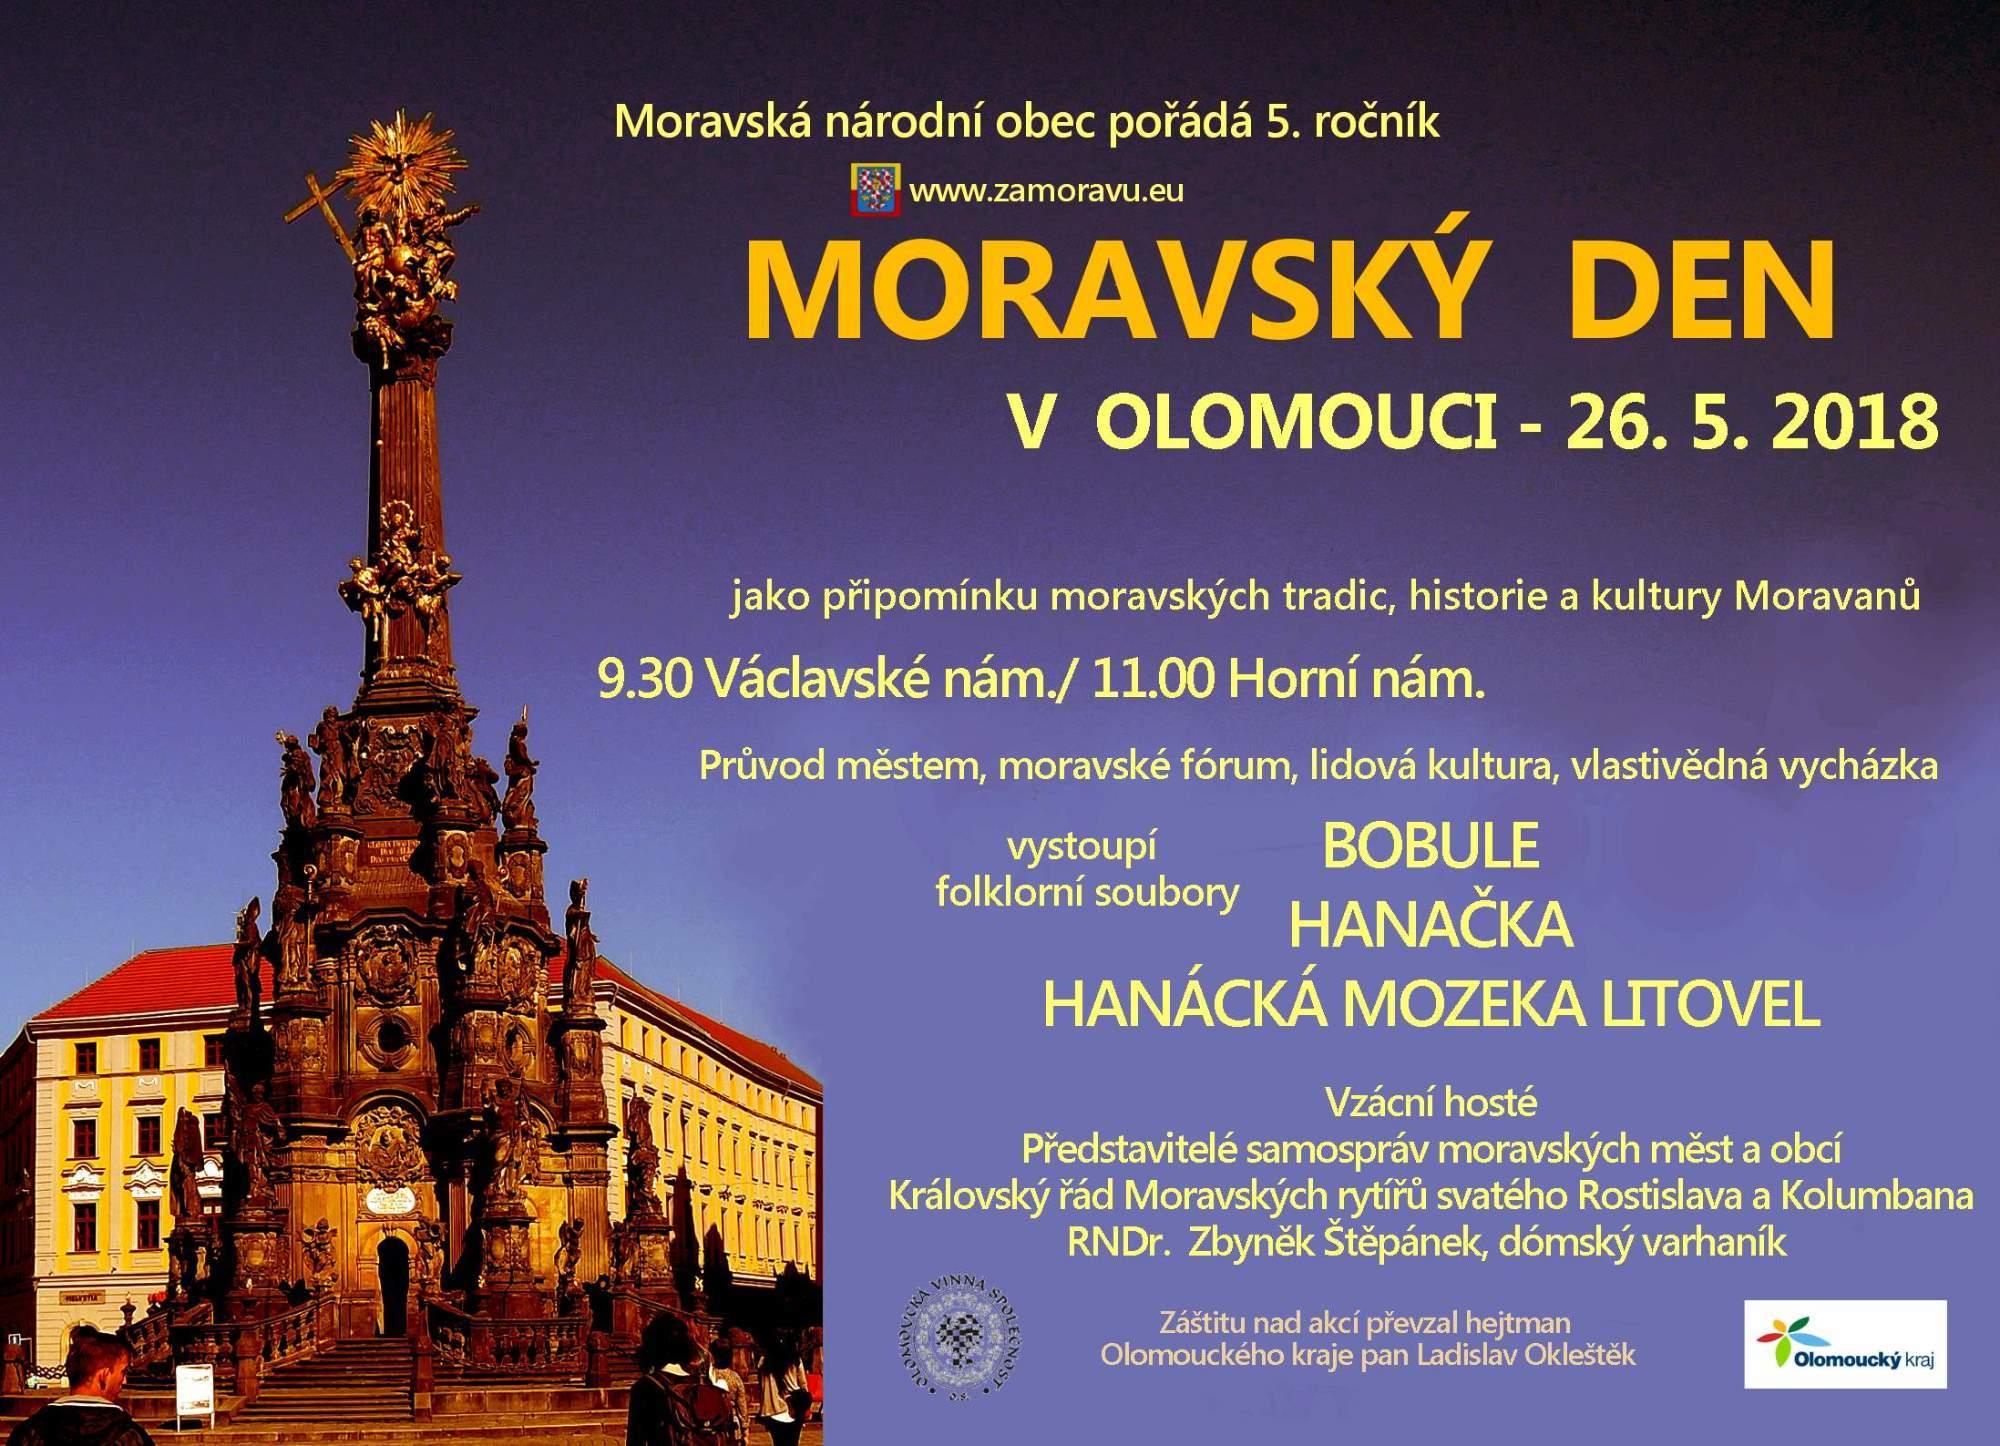 Moravský den Olomouc 2018